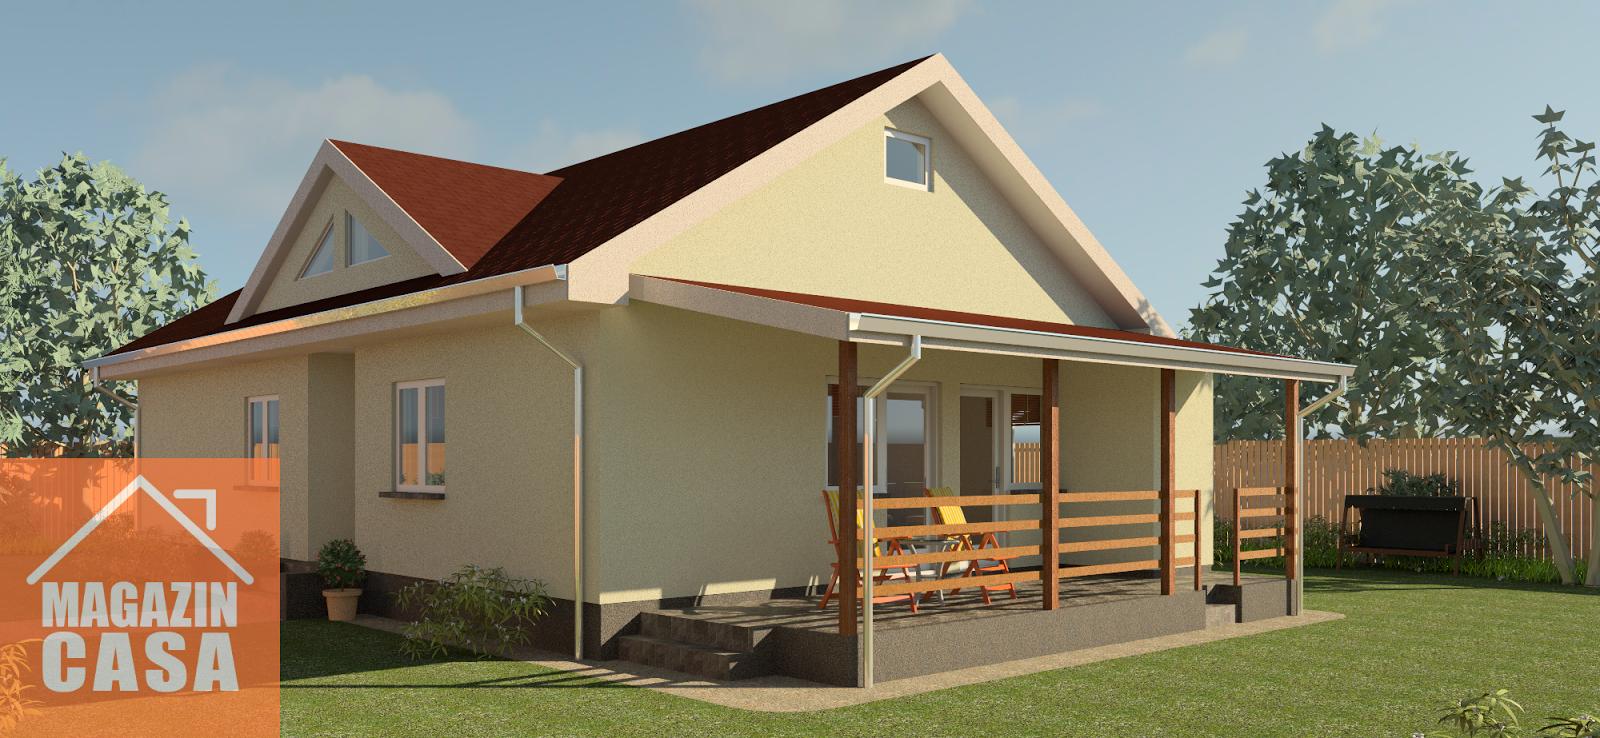 Arhiconstruct proiect casa parter casa a20 magazin casa 3 for Proiecte case parter